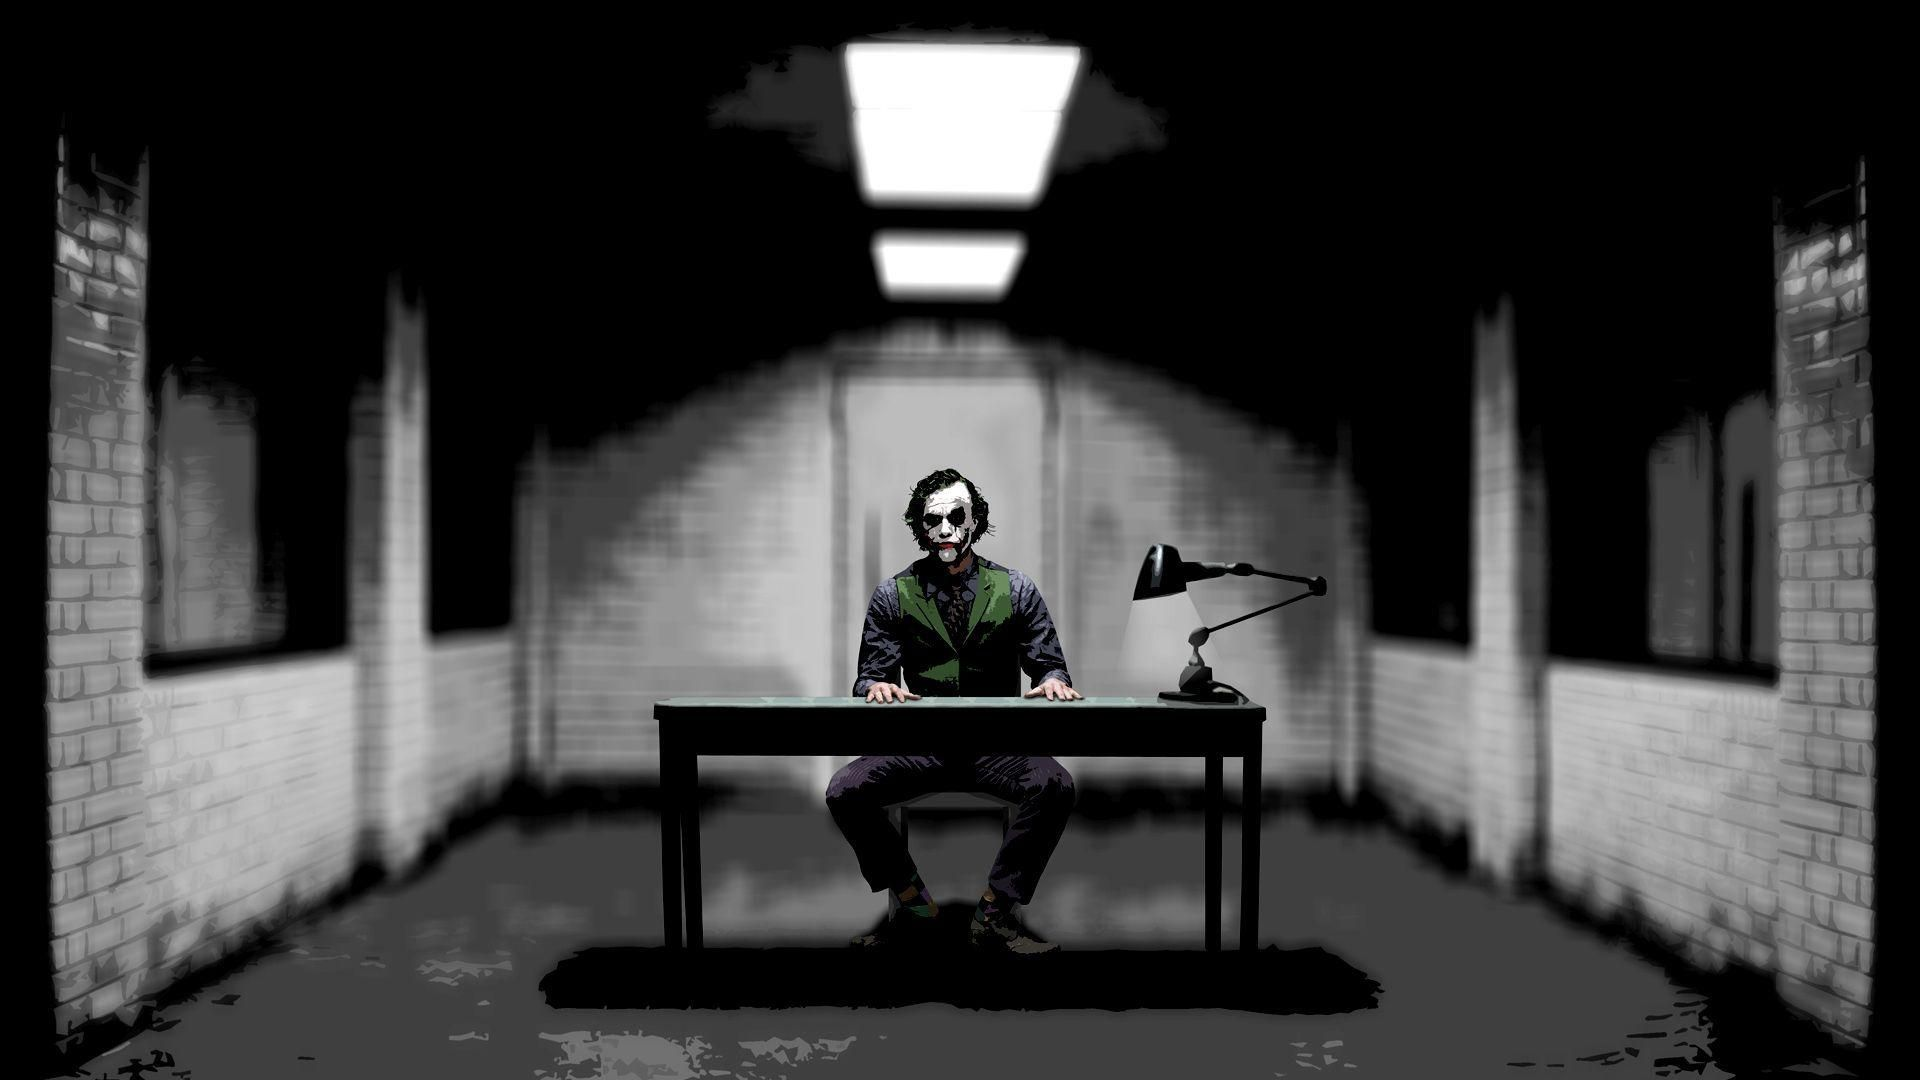 The joker  the dark knight Knight The Dark Joker Movies